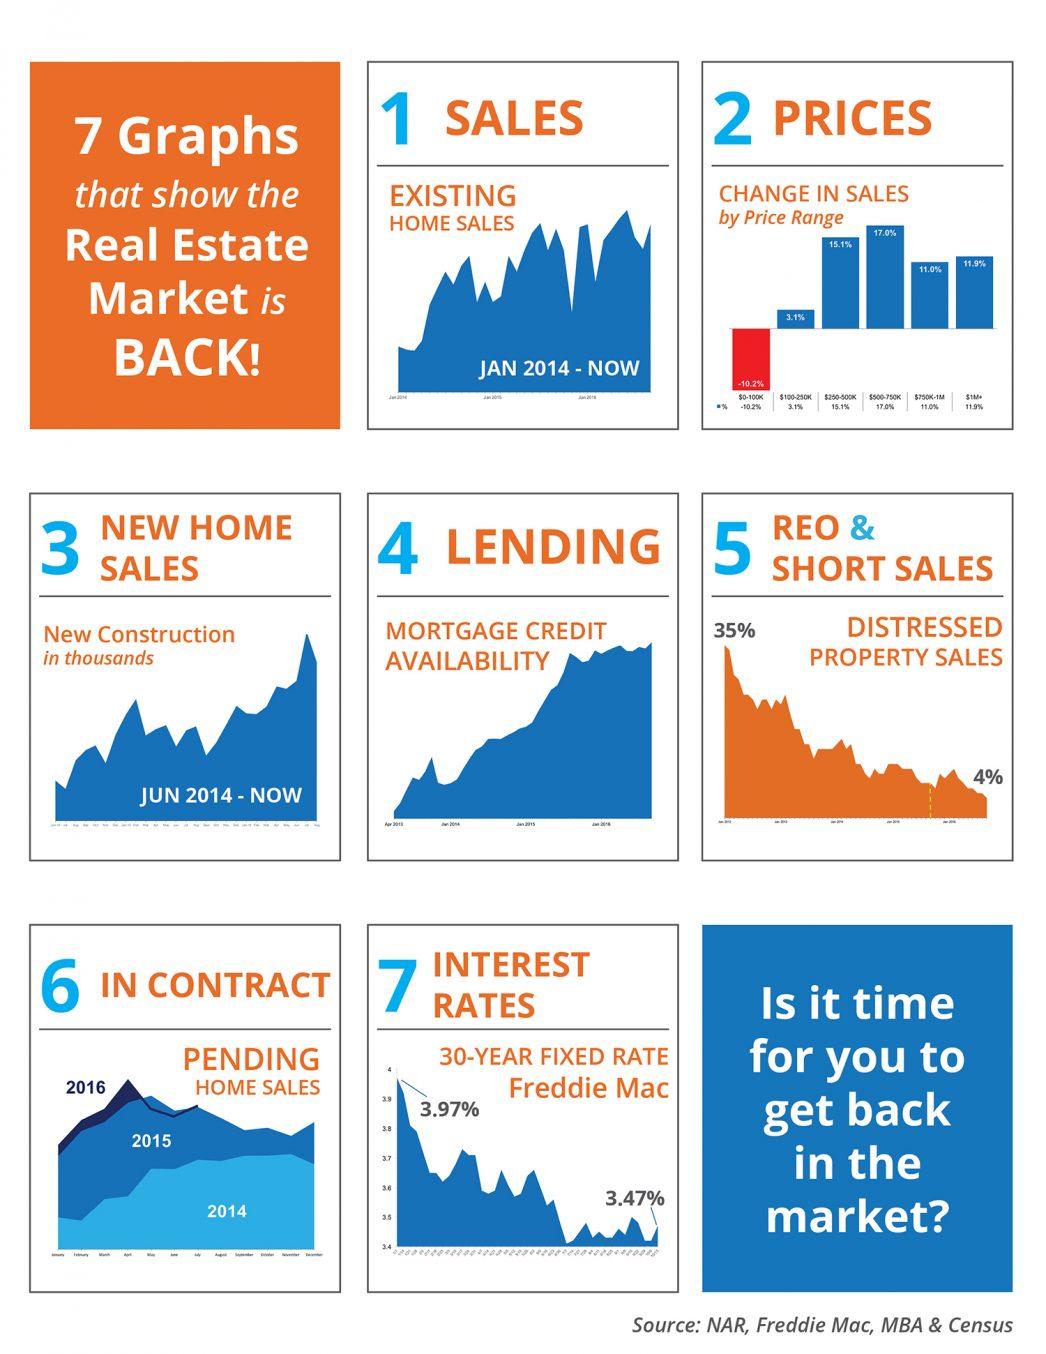 Real Estate is Back!